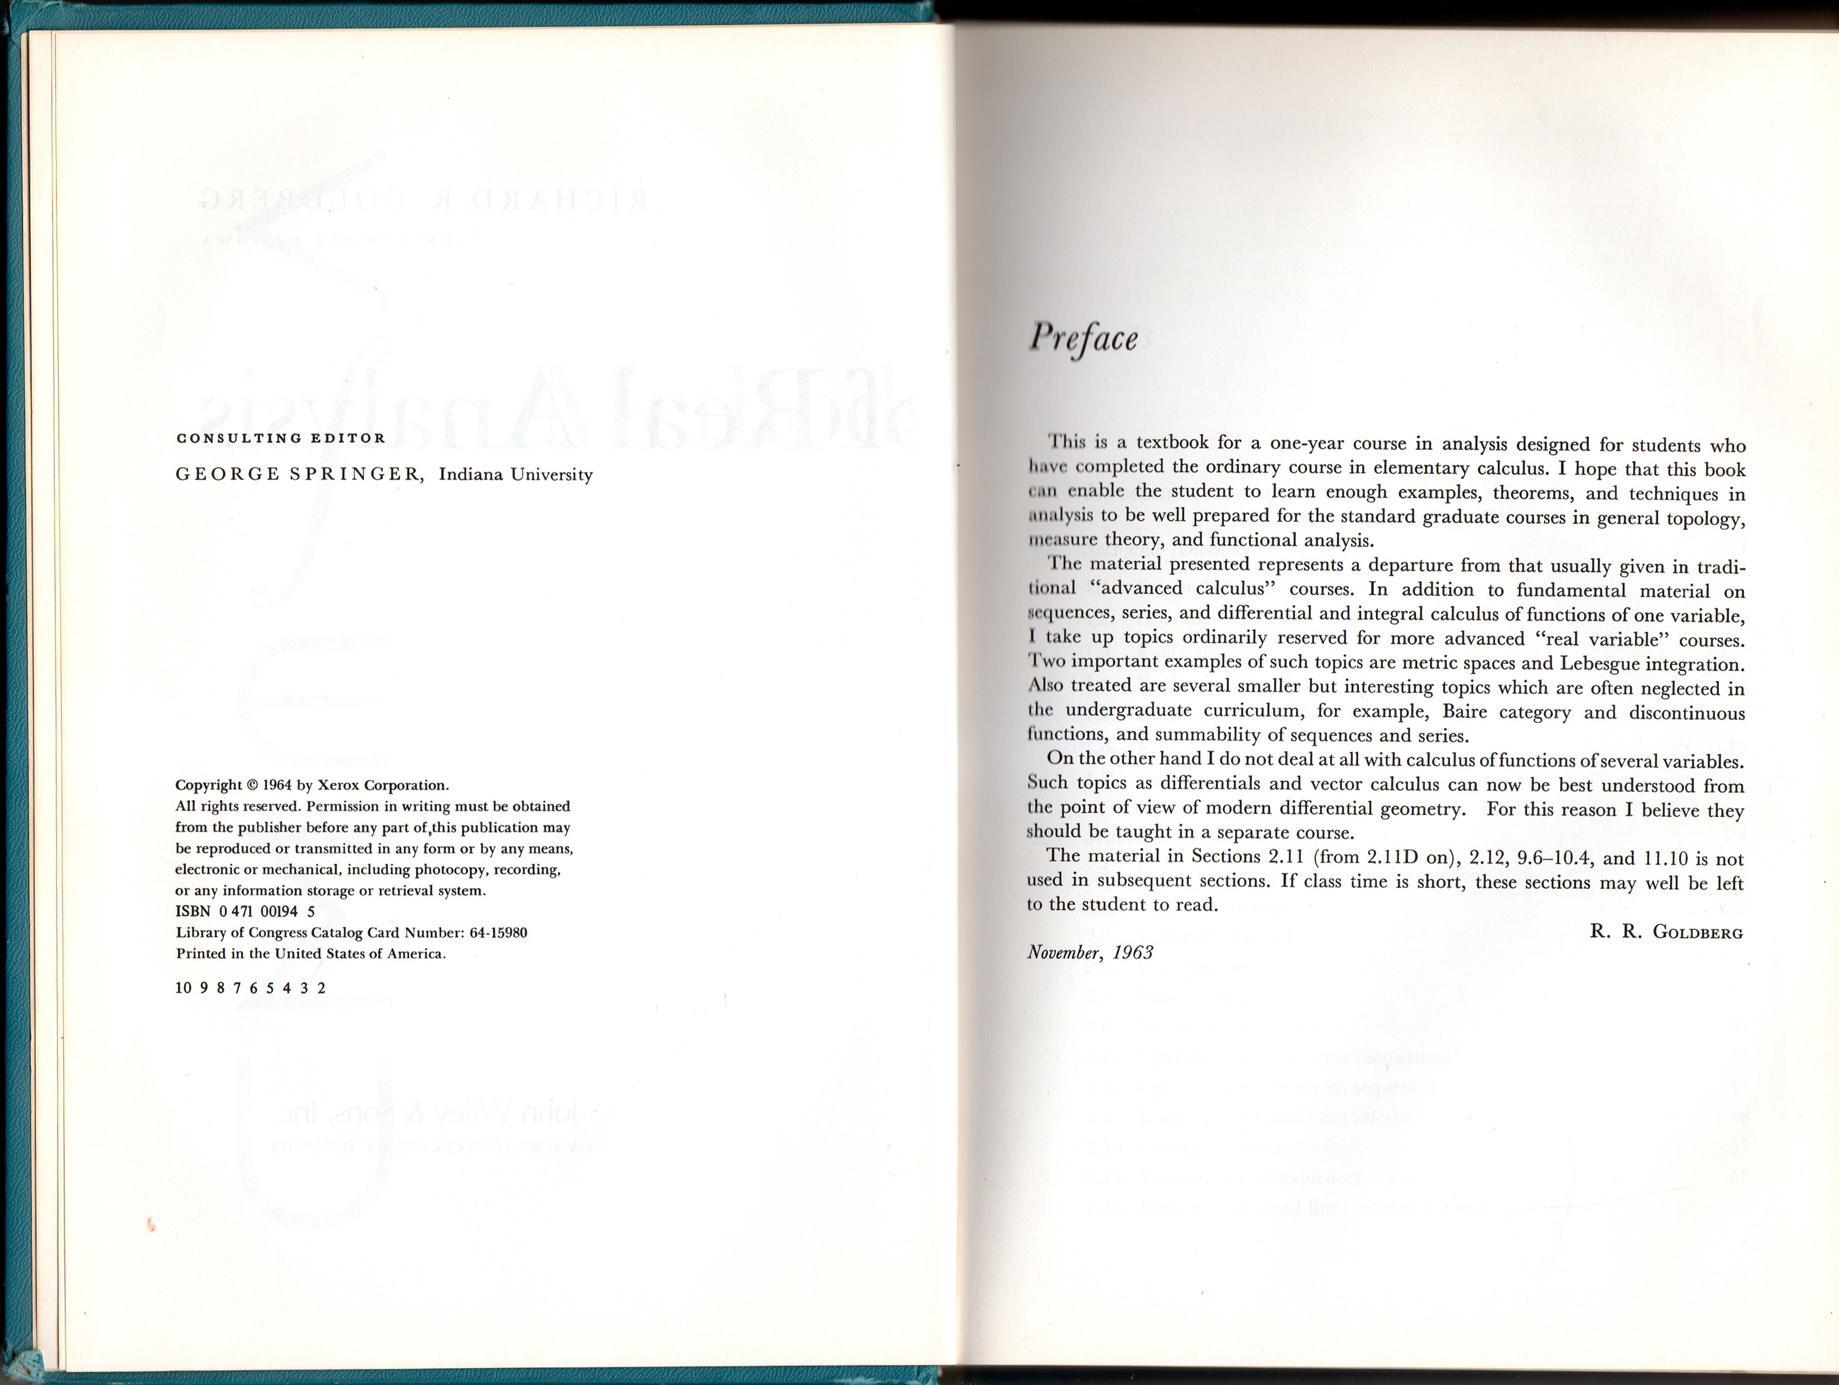 Methods of Real Analysis  ISBN 0471001945,